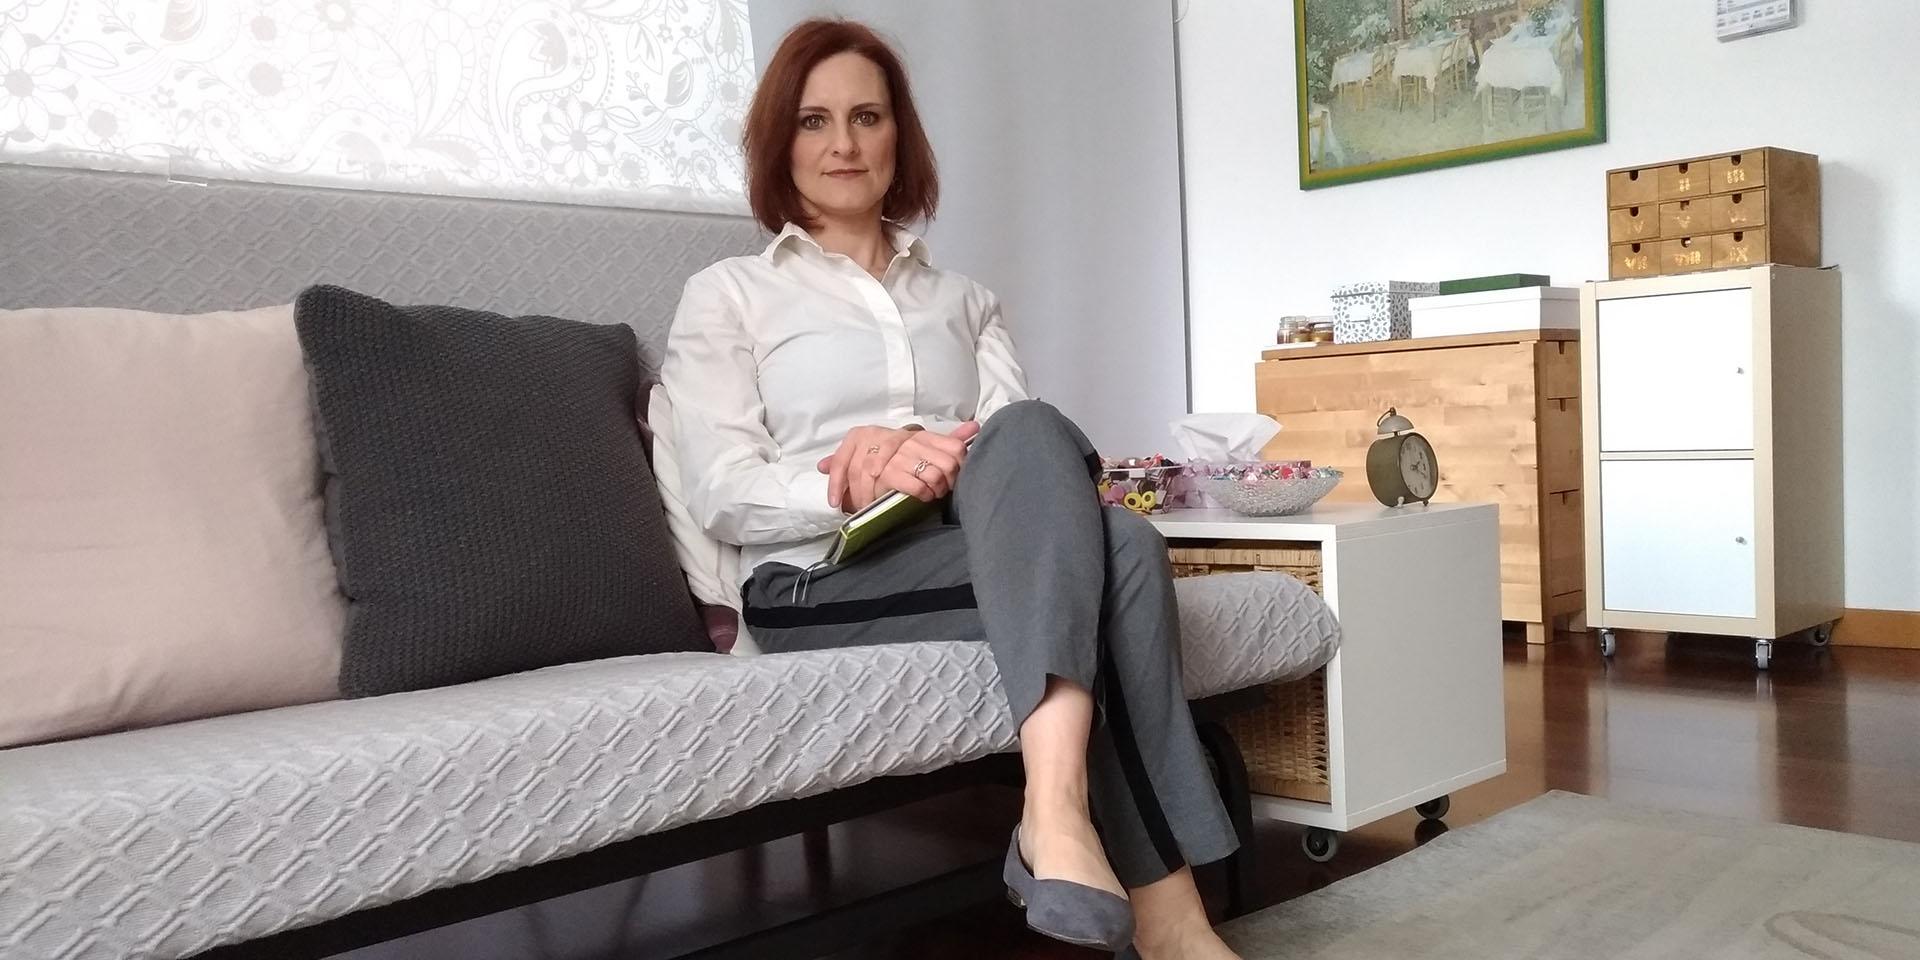 Dott.ssa Zanatta Psicoterapeuta a Padova